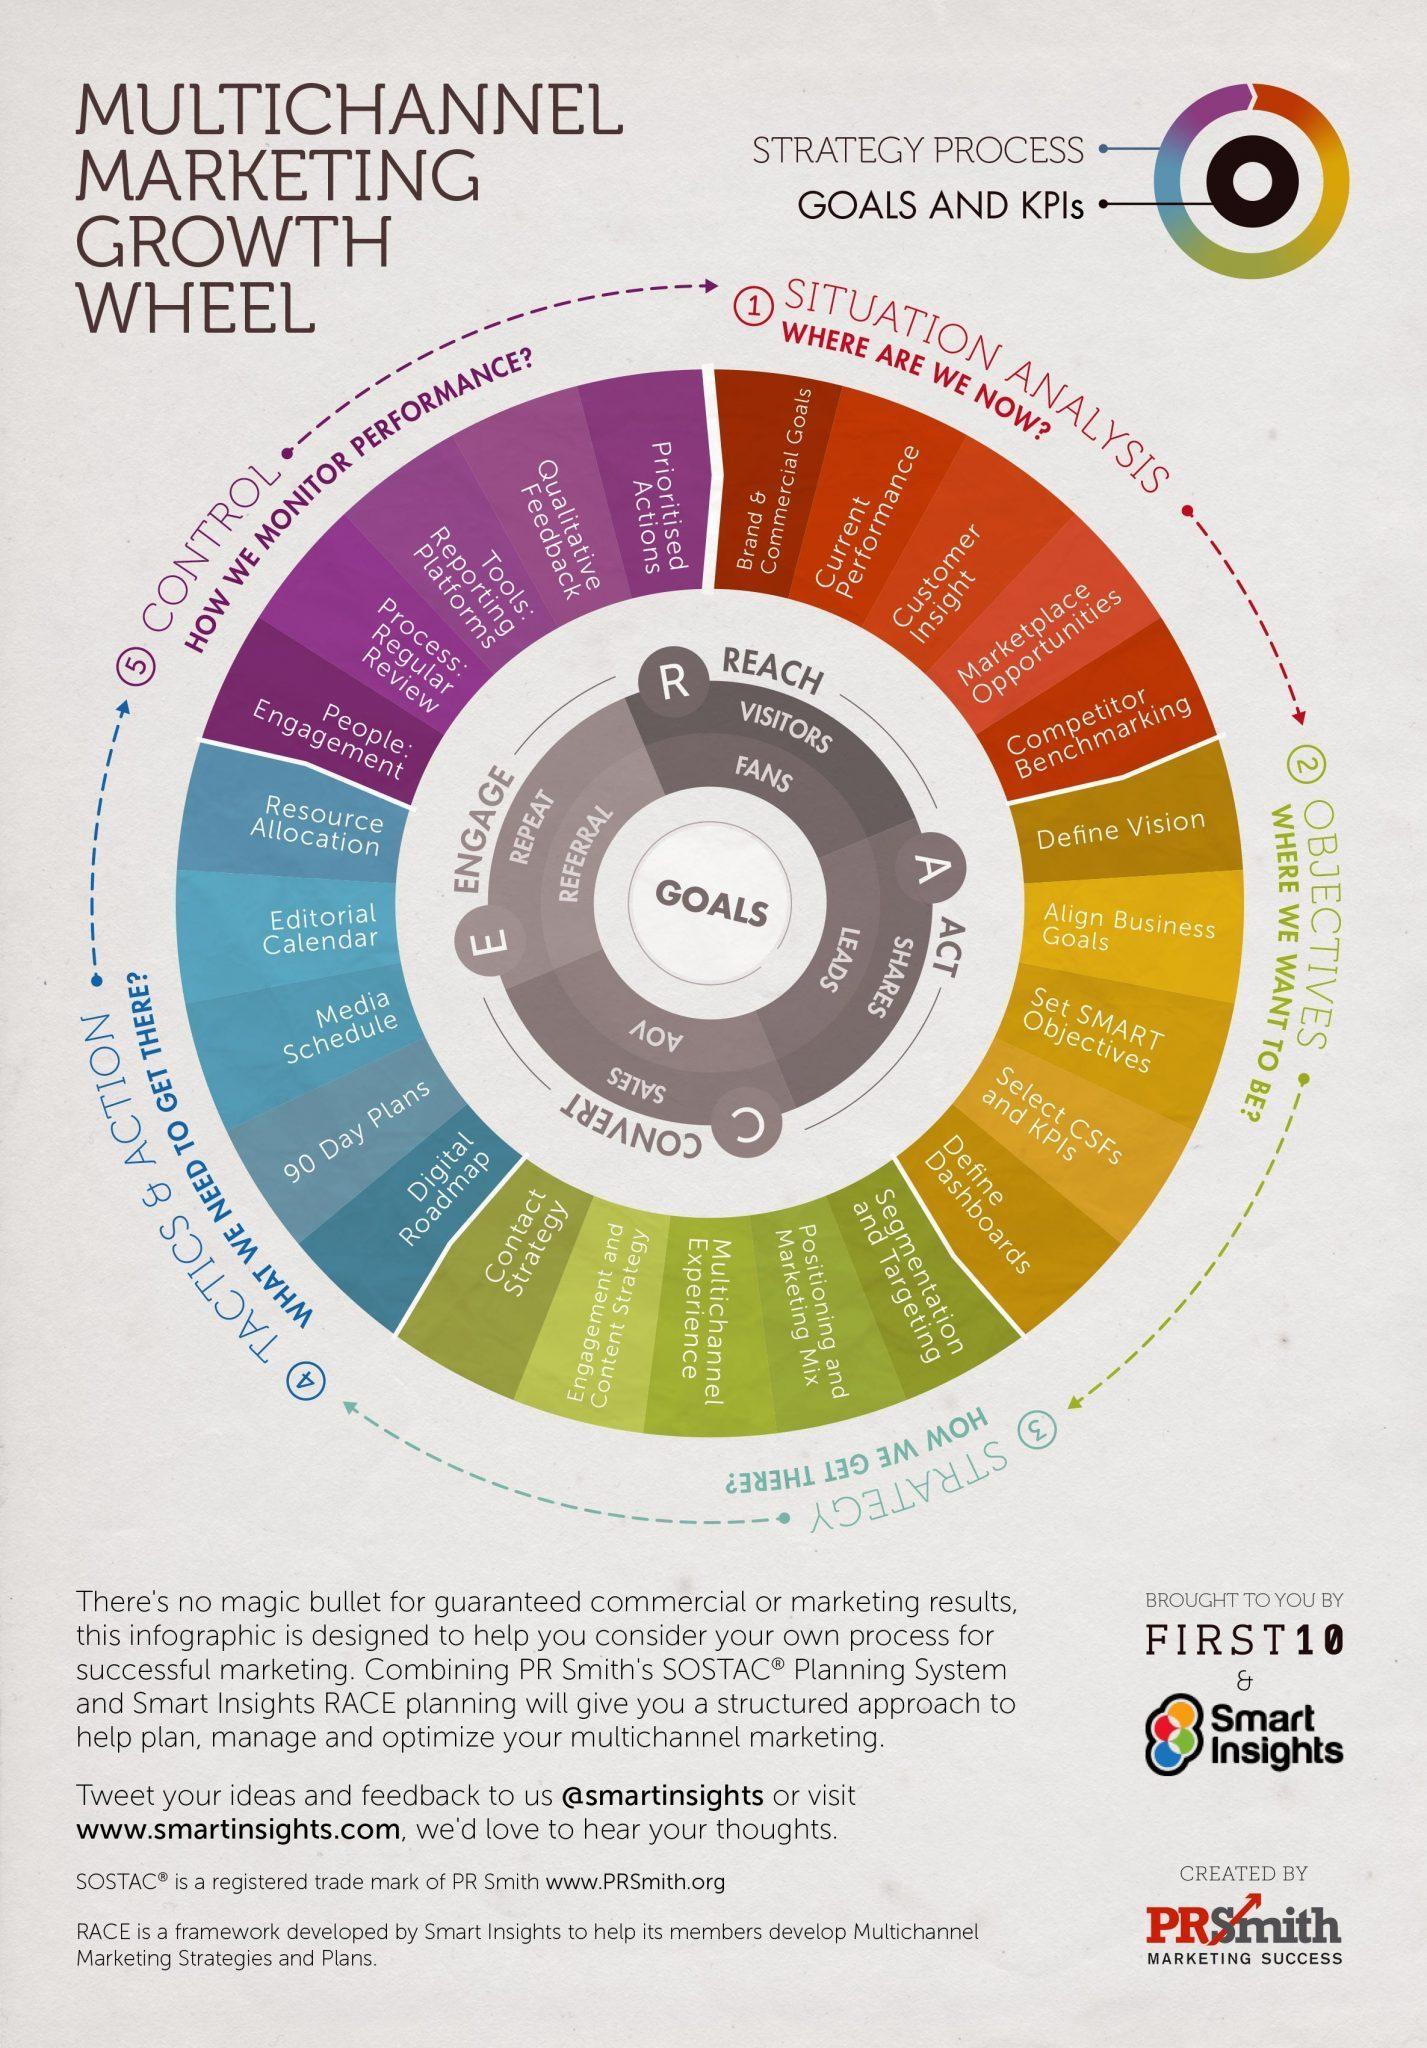 SOSTAC RACE marketing growth wheel smart insights prsmith